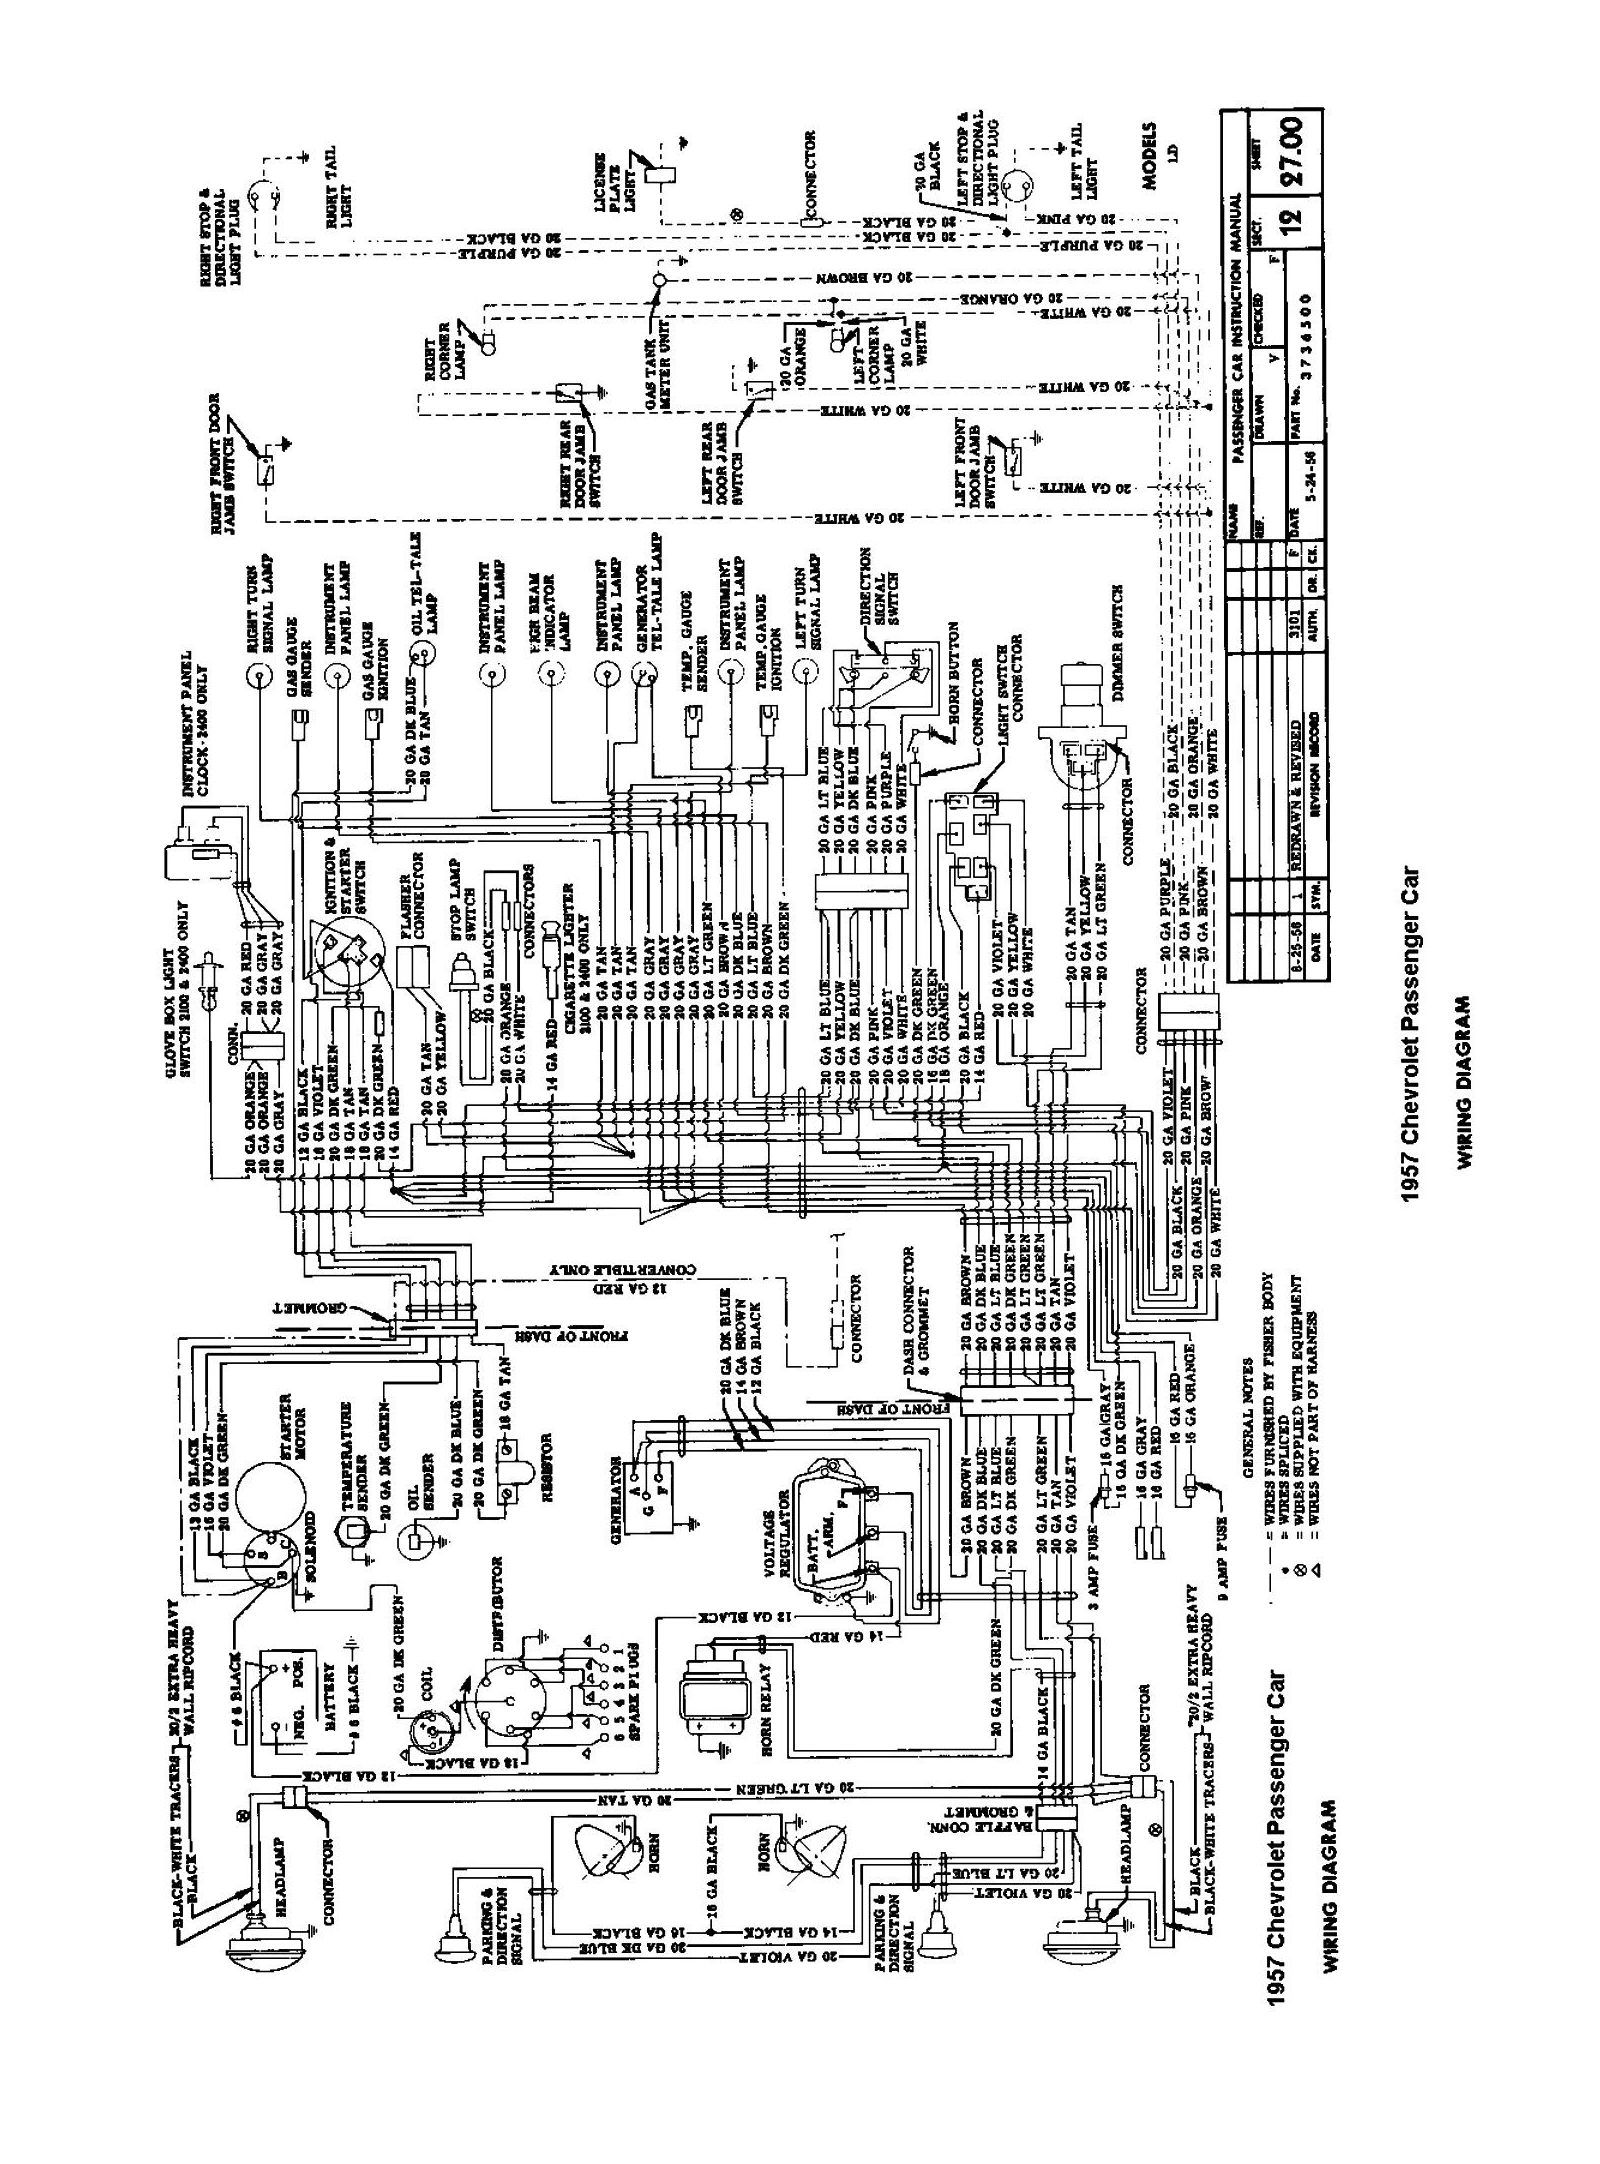 57 Chevy wiring diagram | 57 chevys | Diagram, 1957